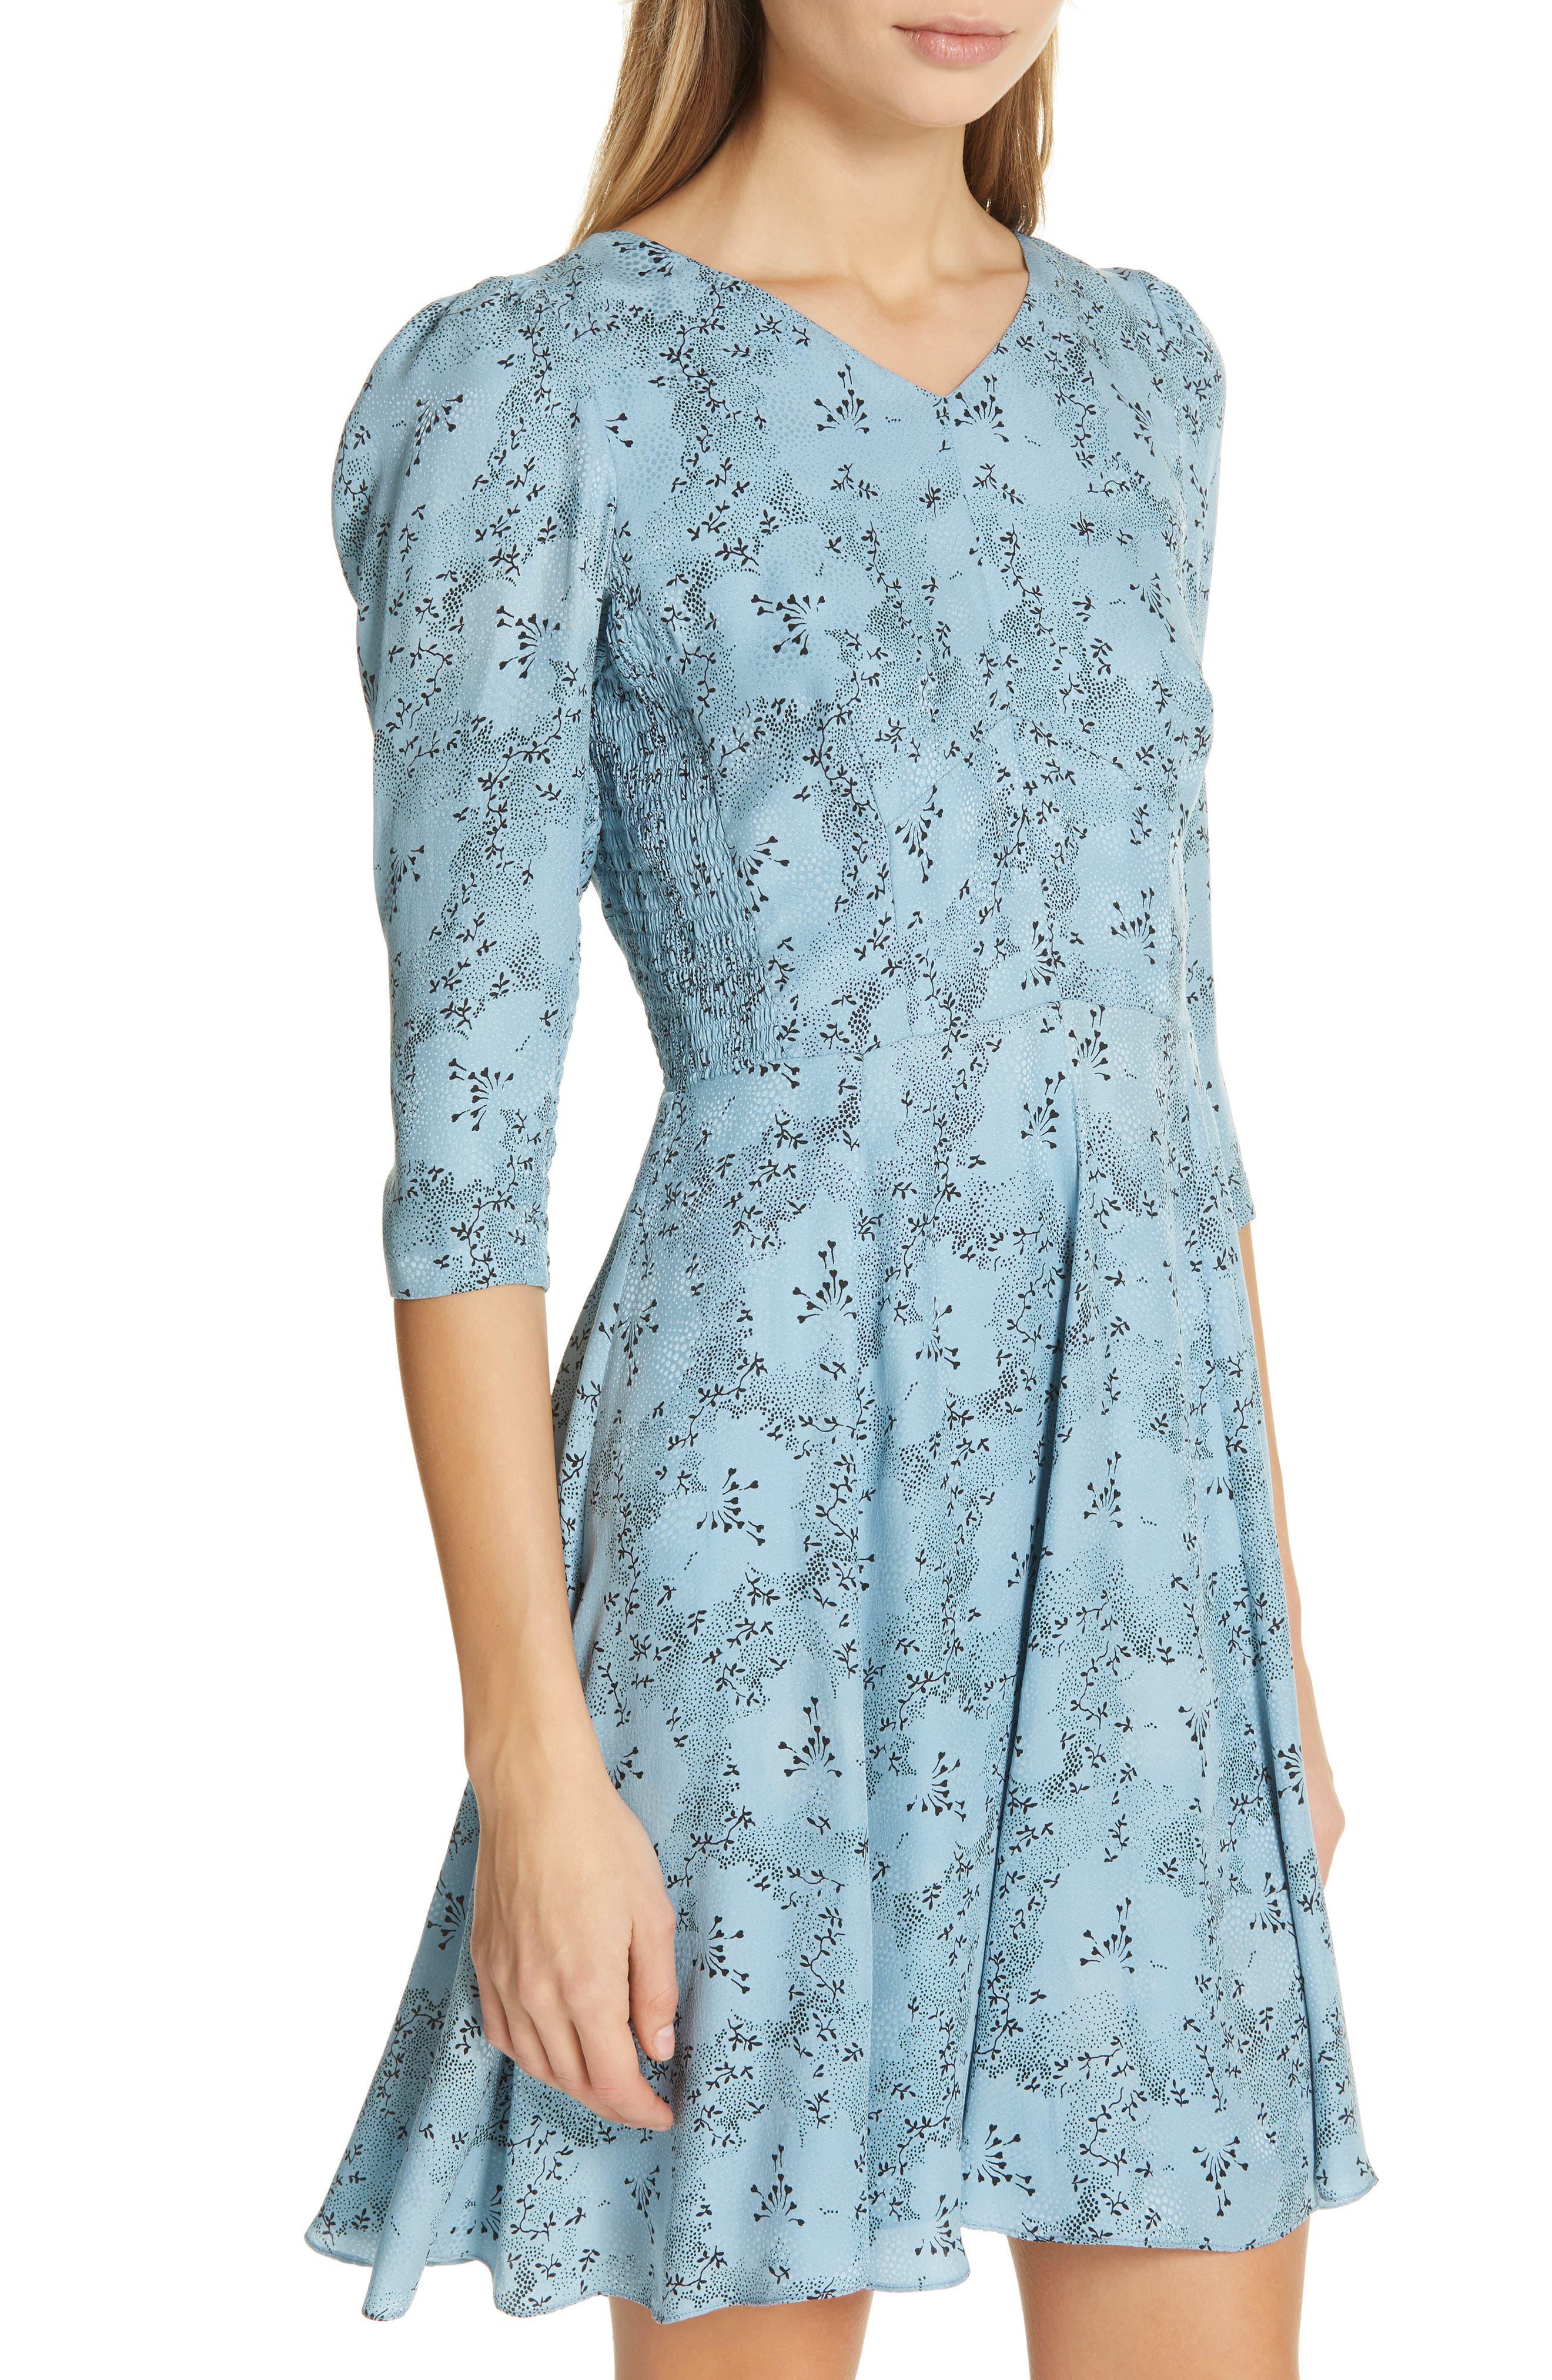 REBECCA TAYLOR, Gianna Floral Silk Dress, Alternate thumbnail 5, color, LAGOON COMBO